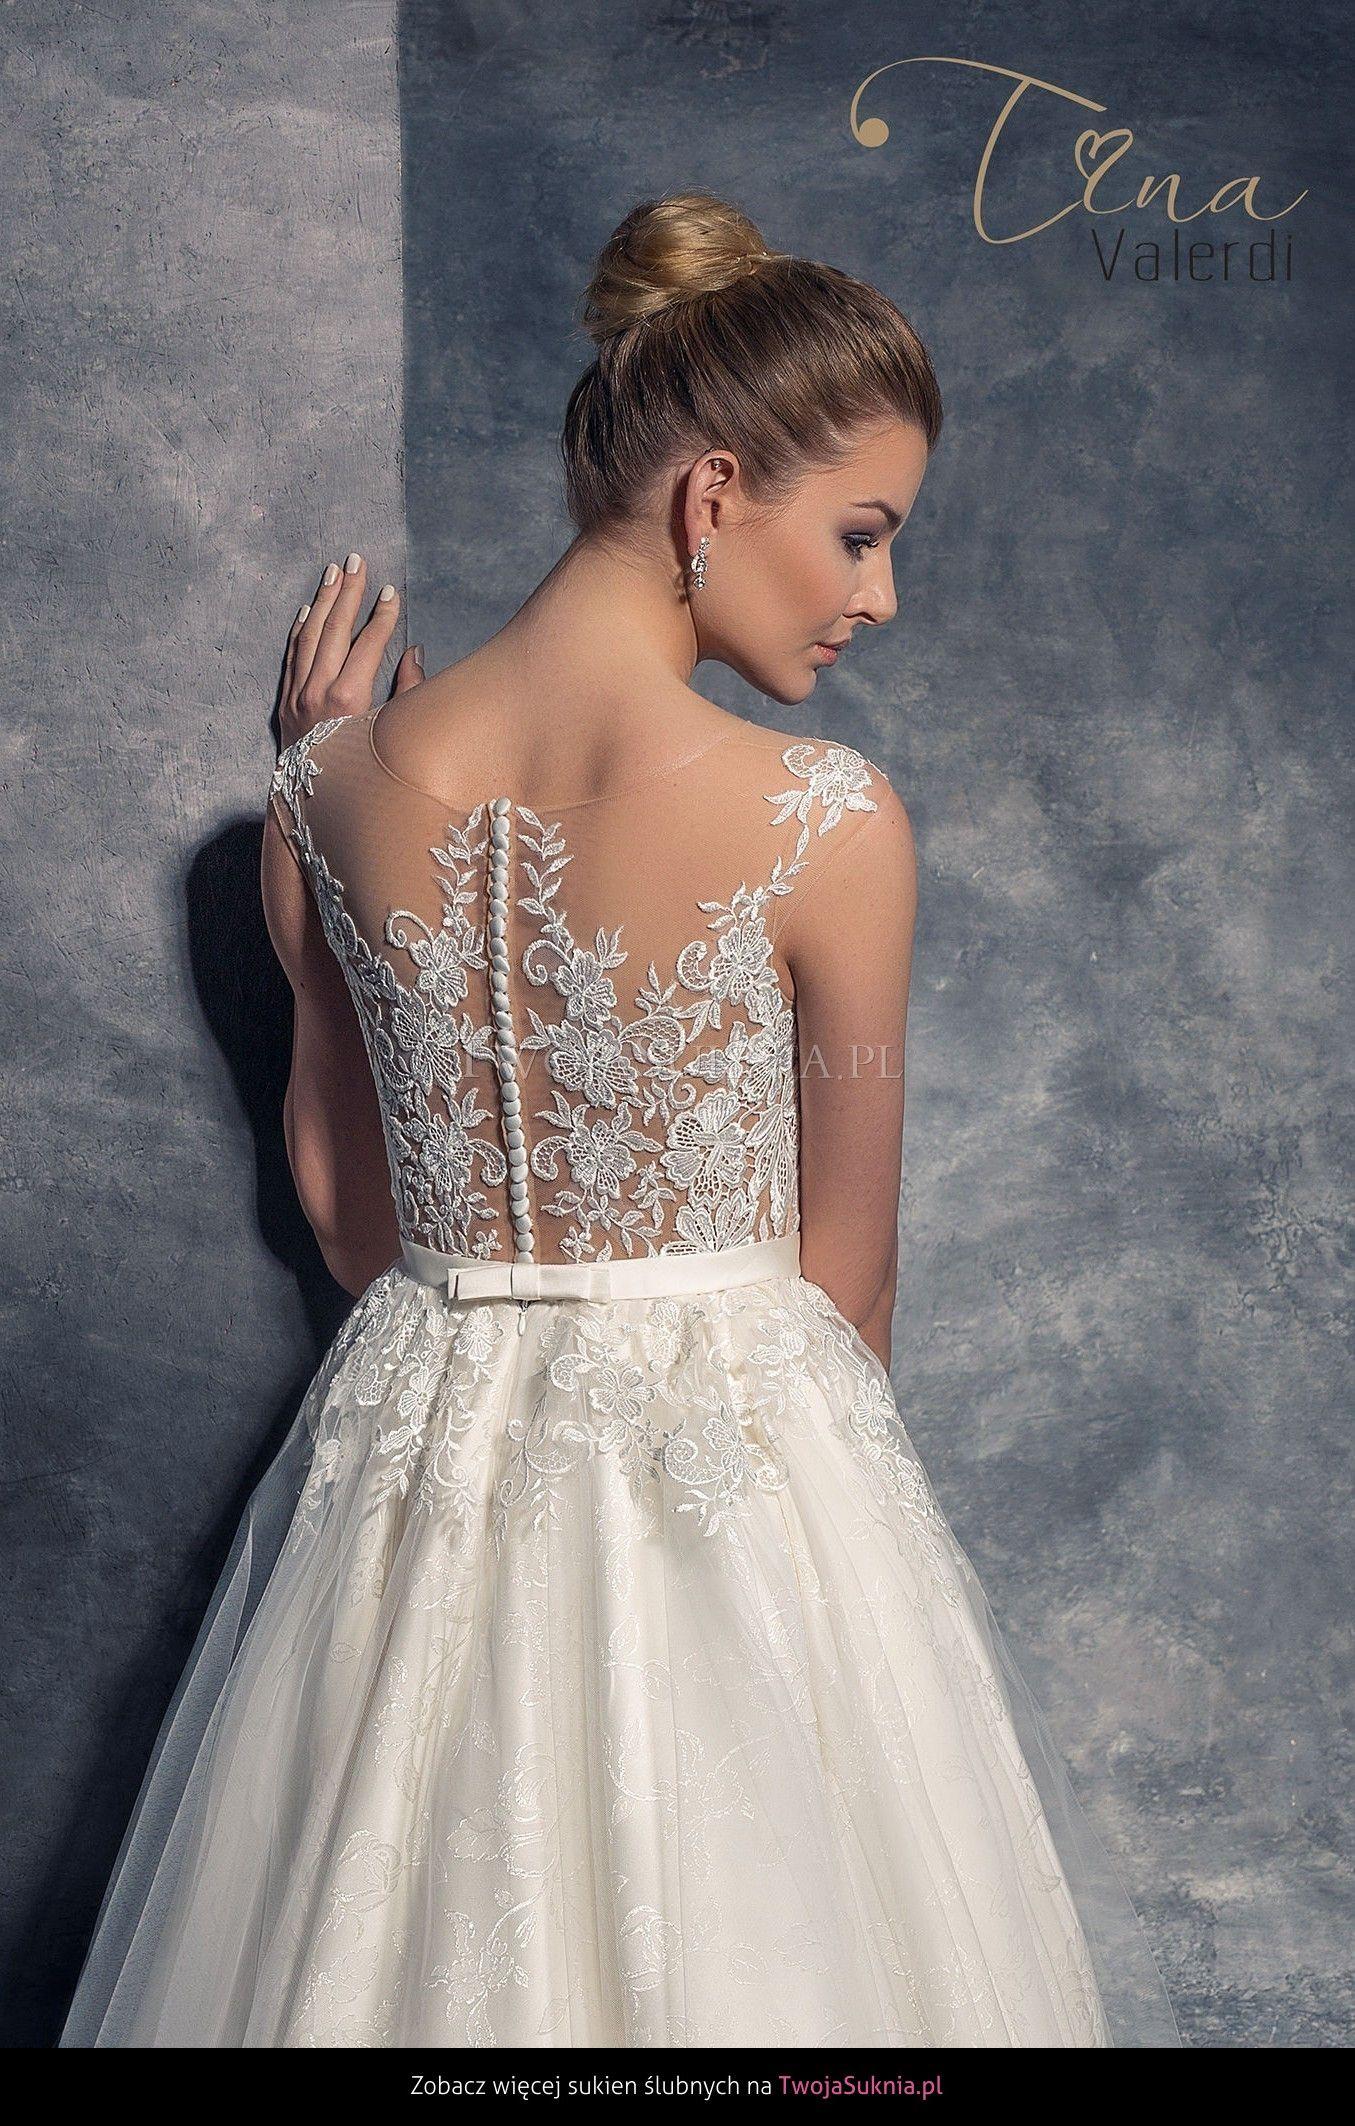 Tina Valerdi Isabel 2016 Wedding Dresses Backless Dress Formal Sleeveless Wedding Dress